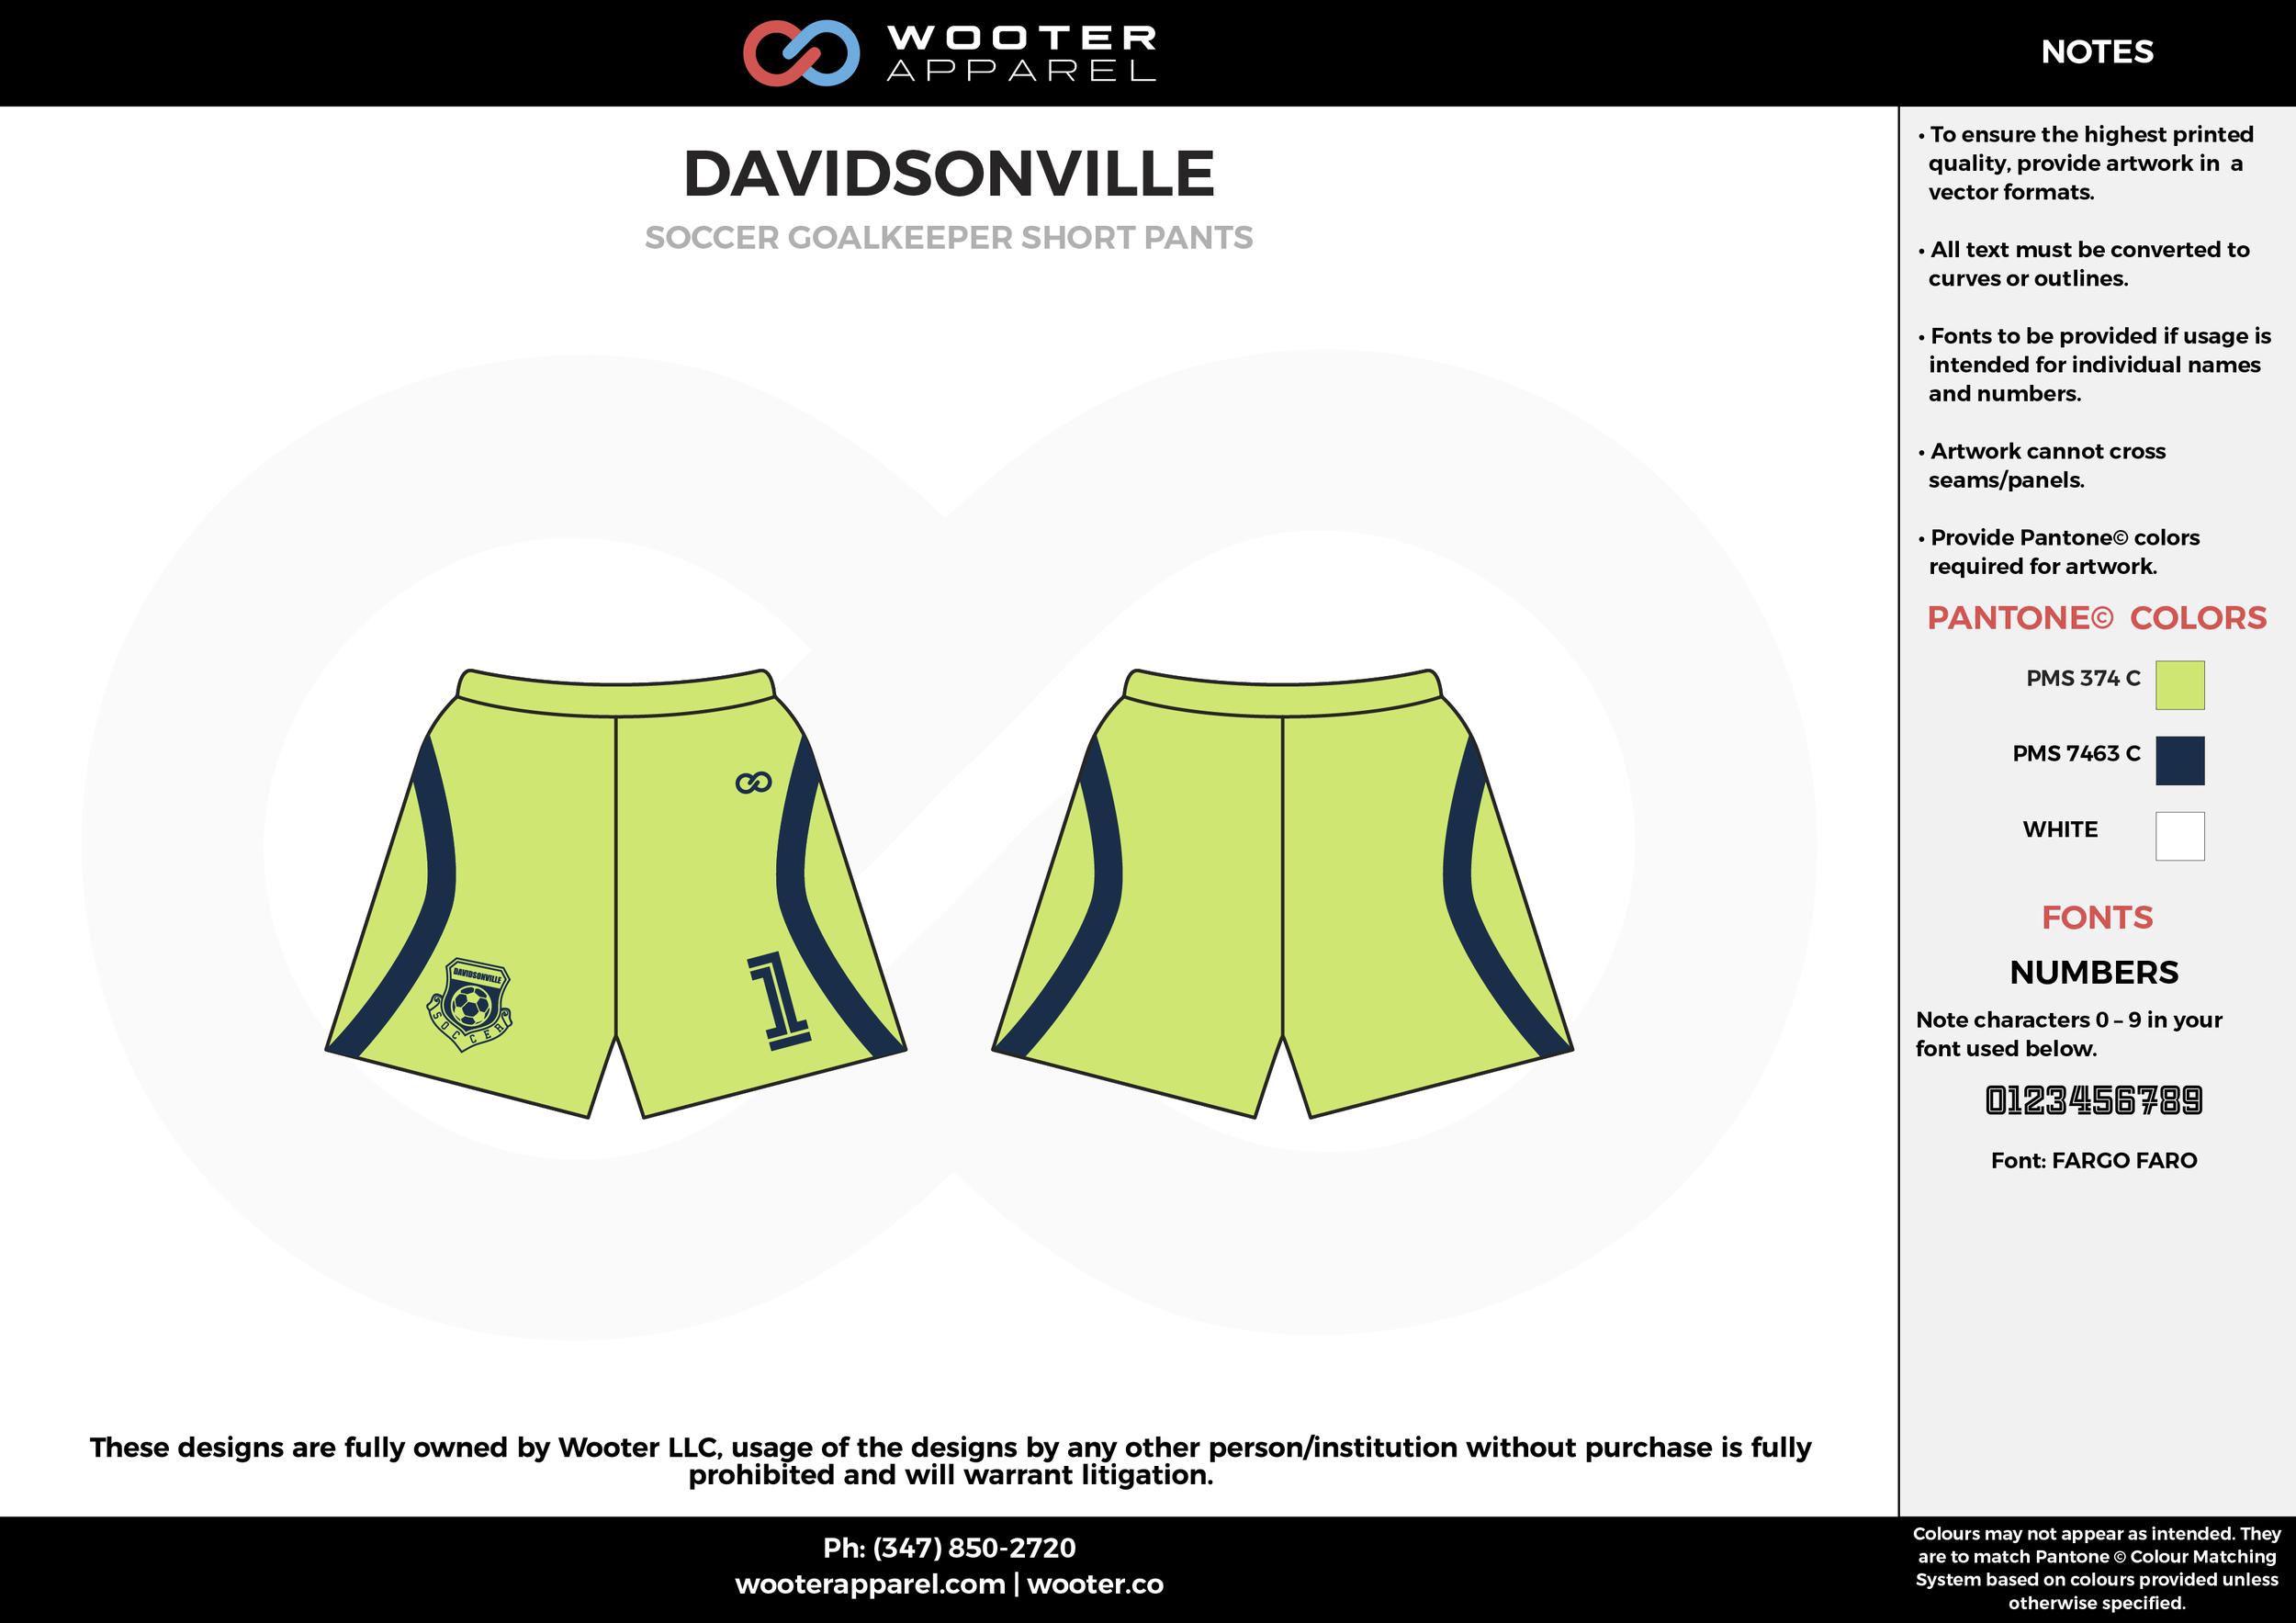 DAVIDSONVILLE apple green black custom sublimated soccer uniform jersey shorts